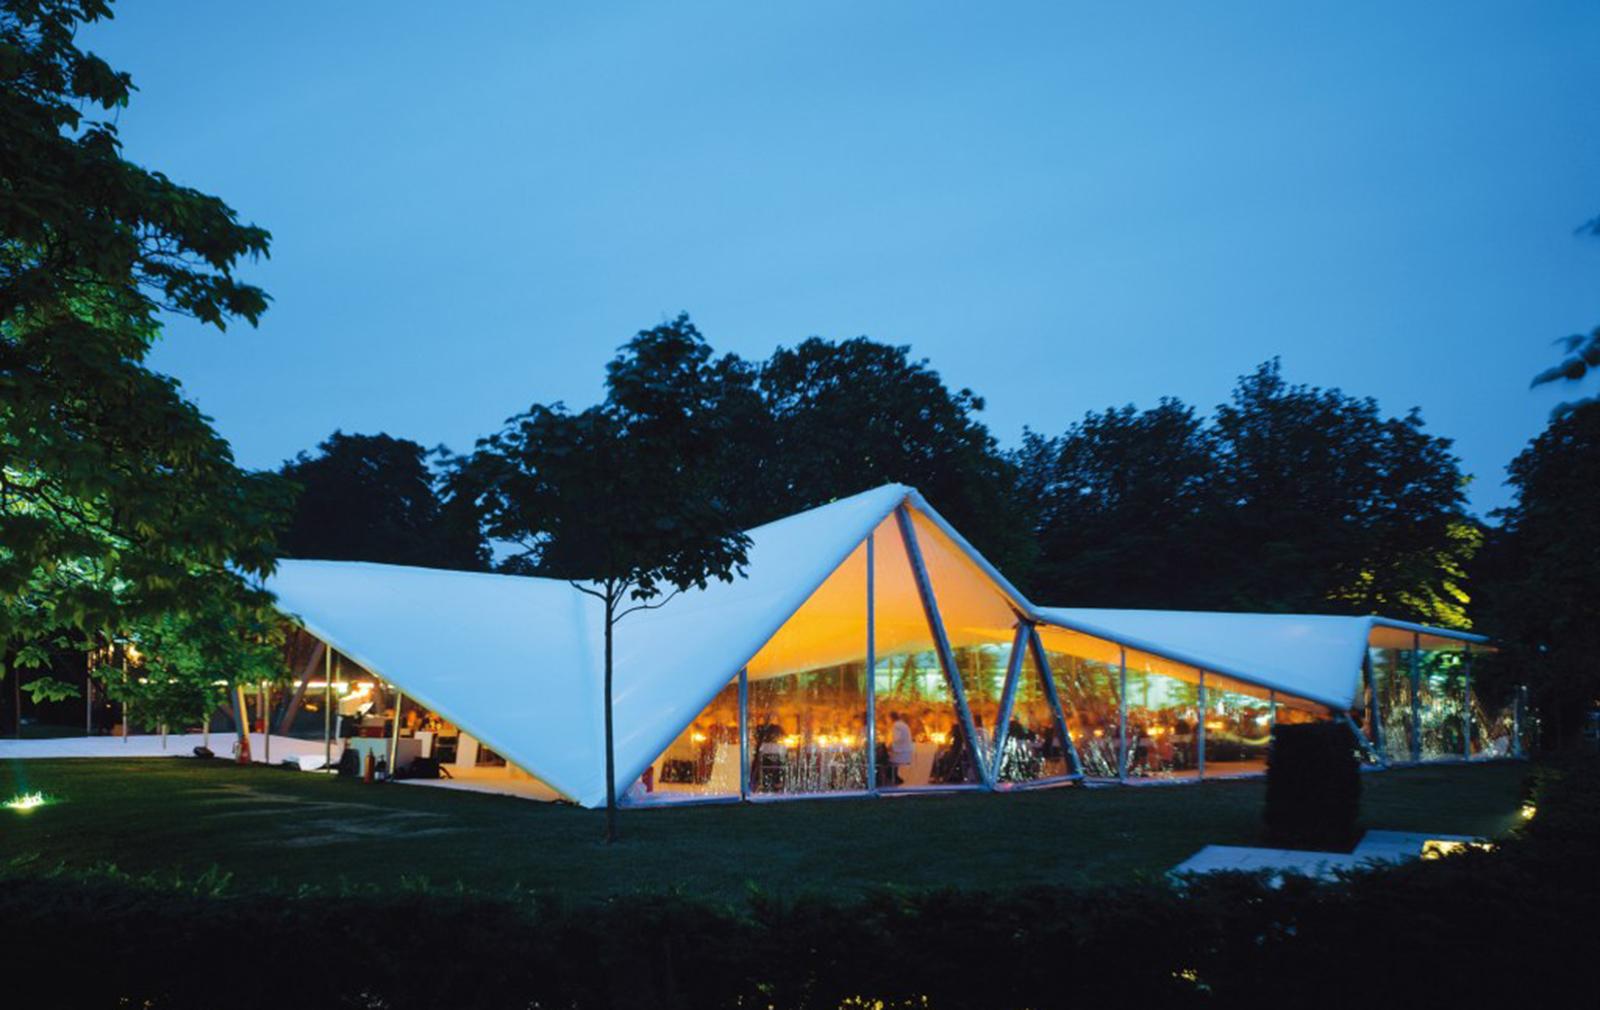 zaha-hadid-serpentine-gallery-pavilion-2000